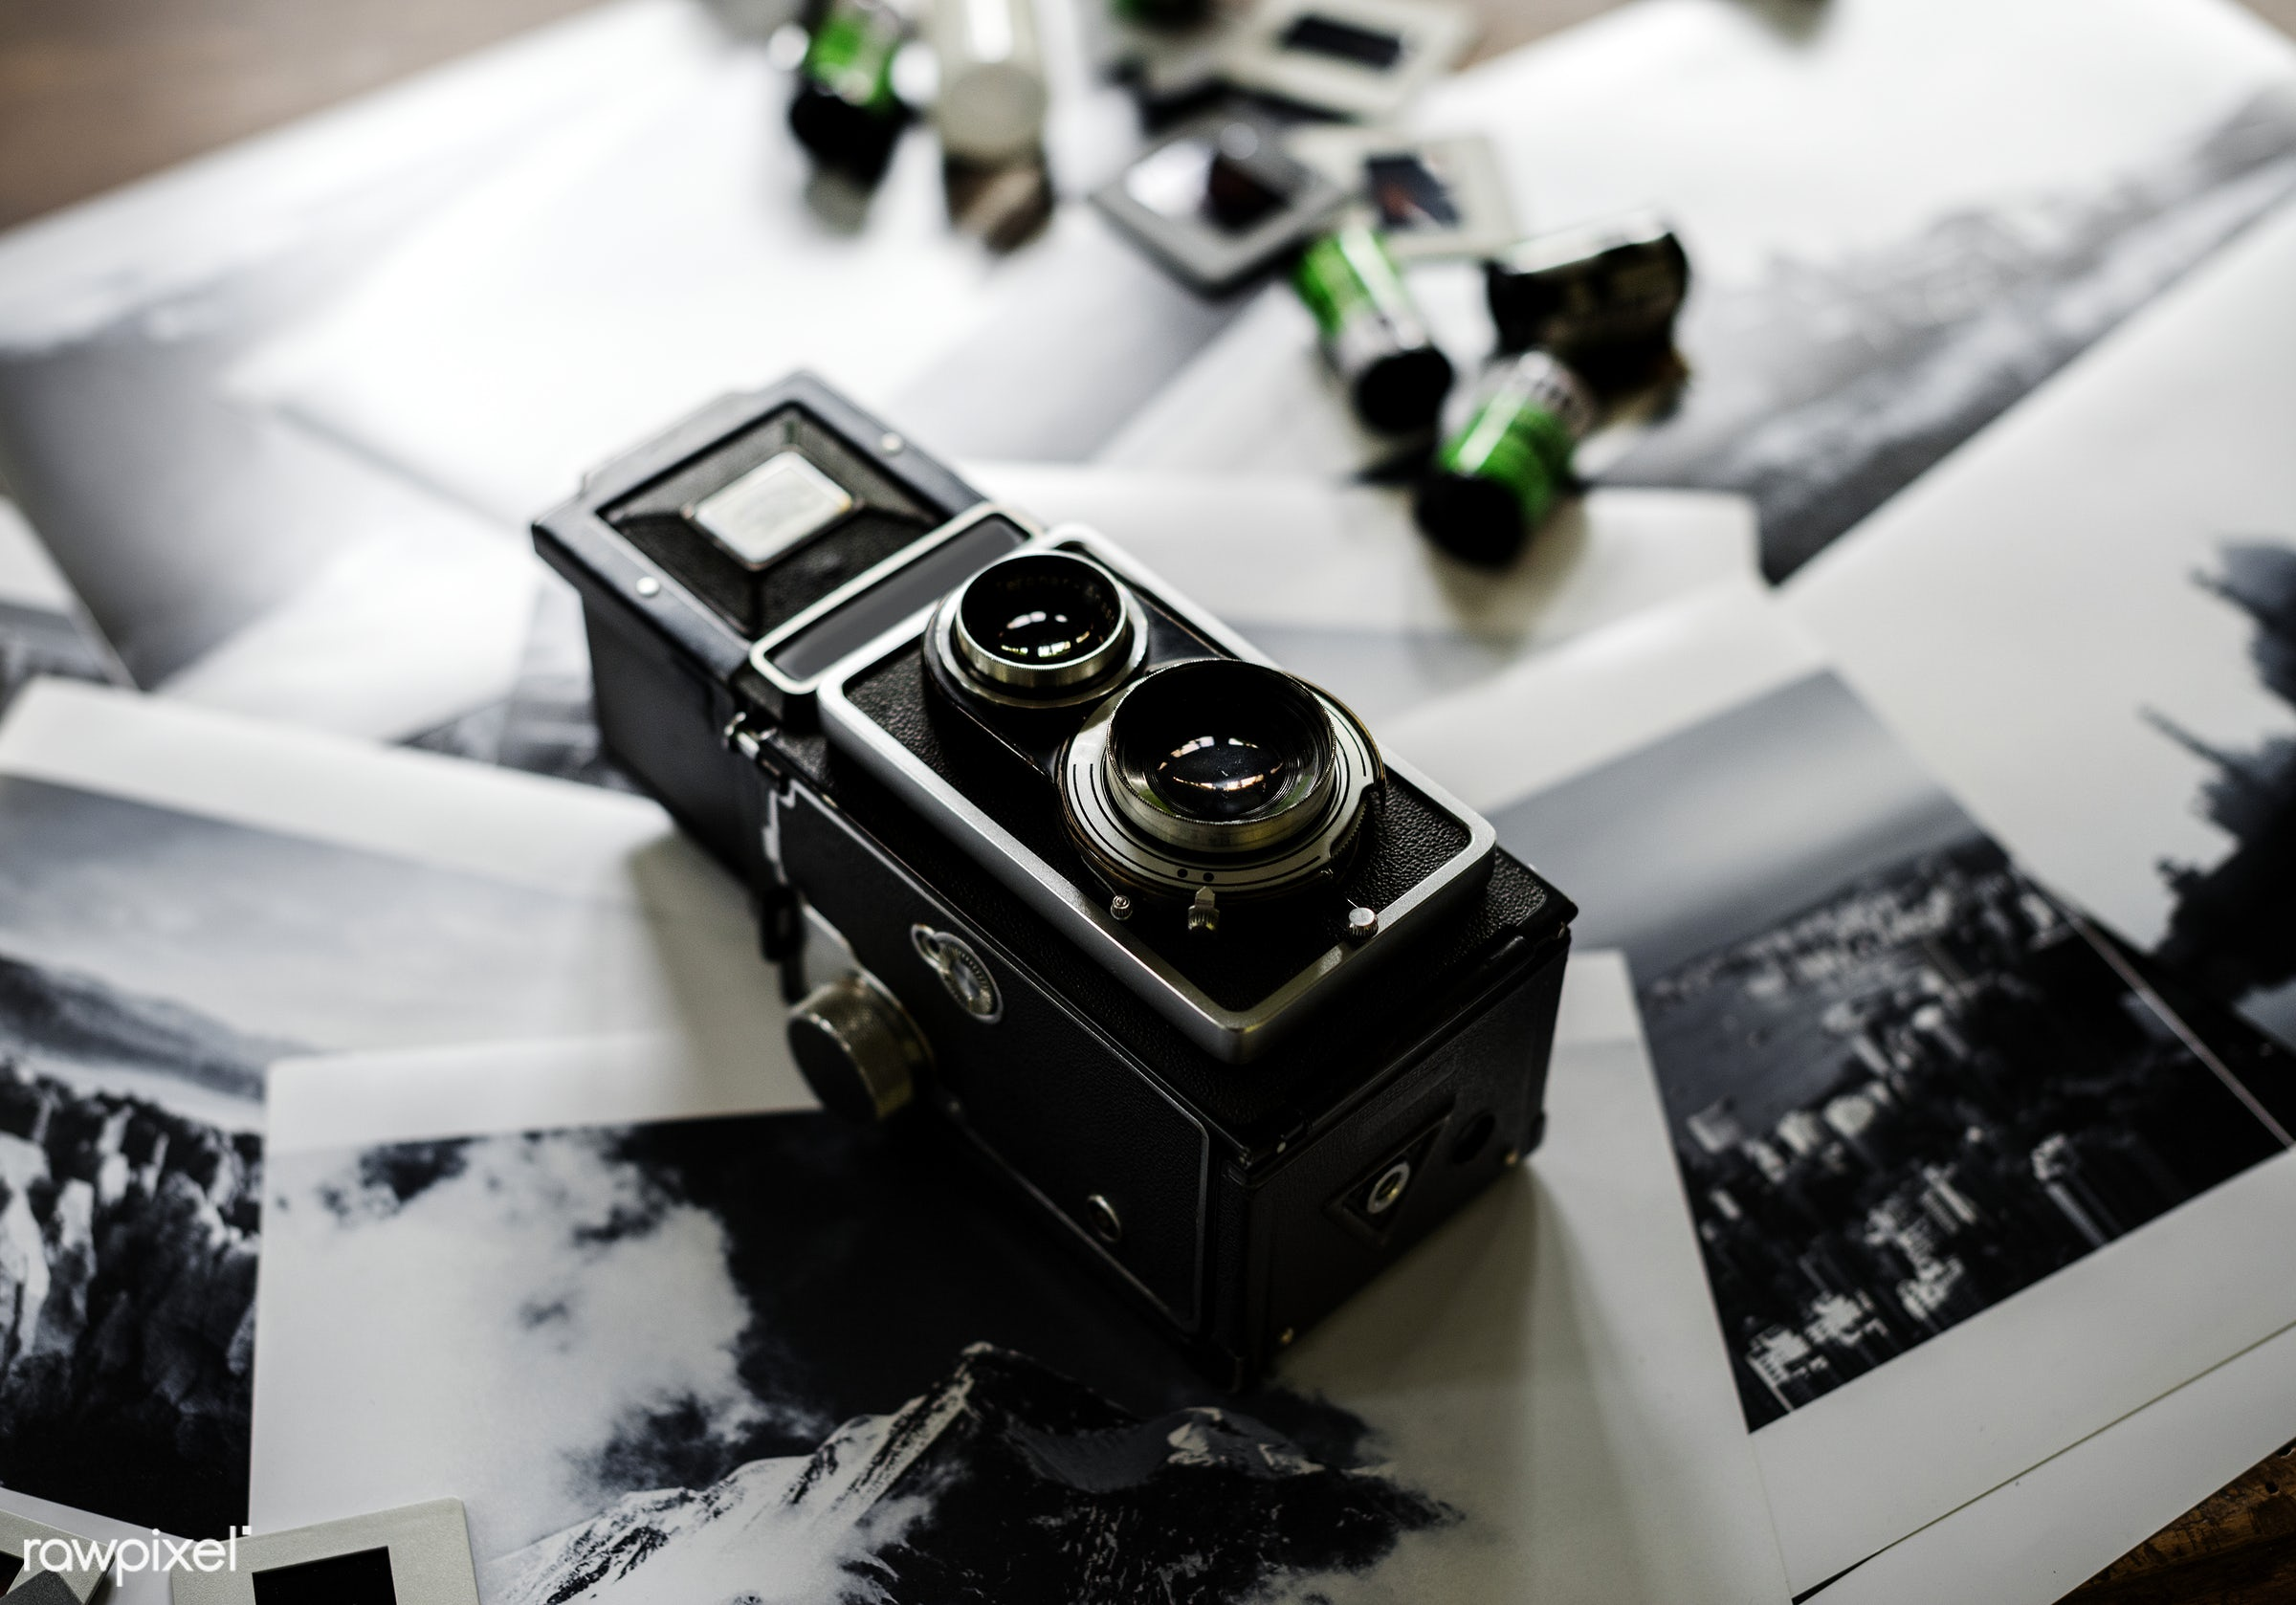 film, vintage, camera, hobby, retro, leisure, photography, hands, photographer, closeup, classic